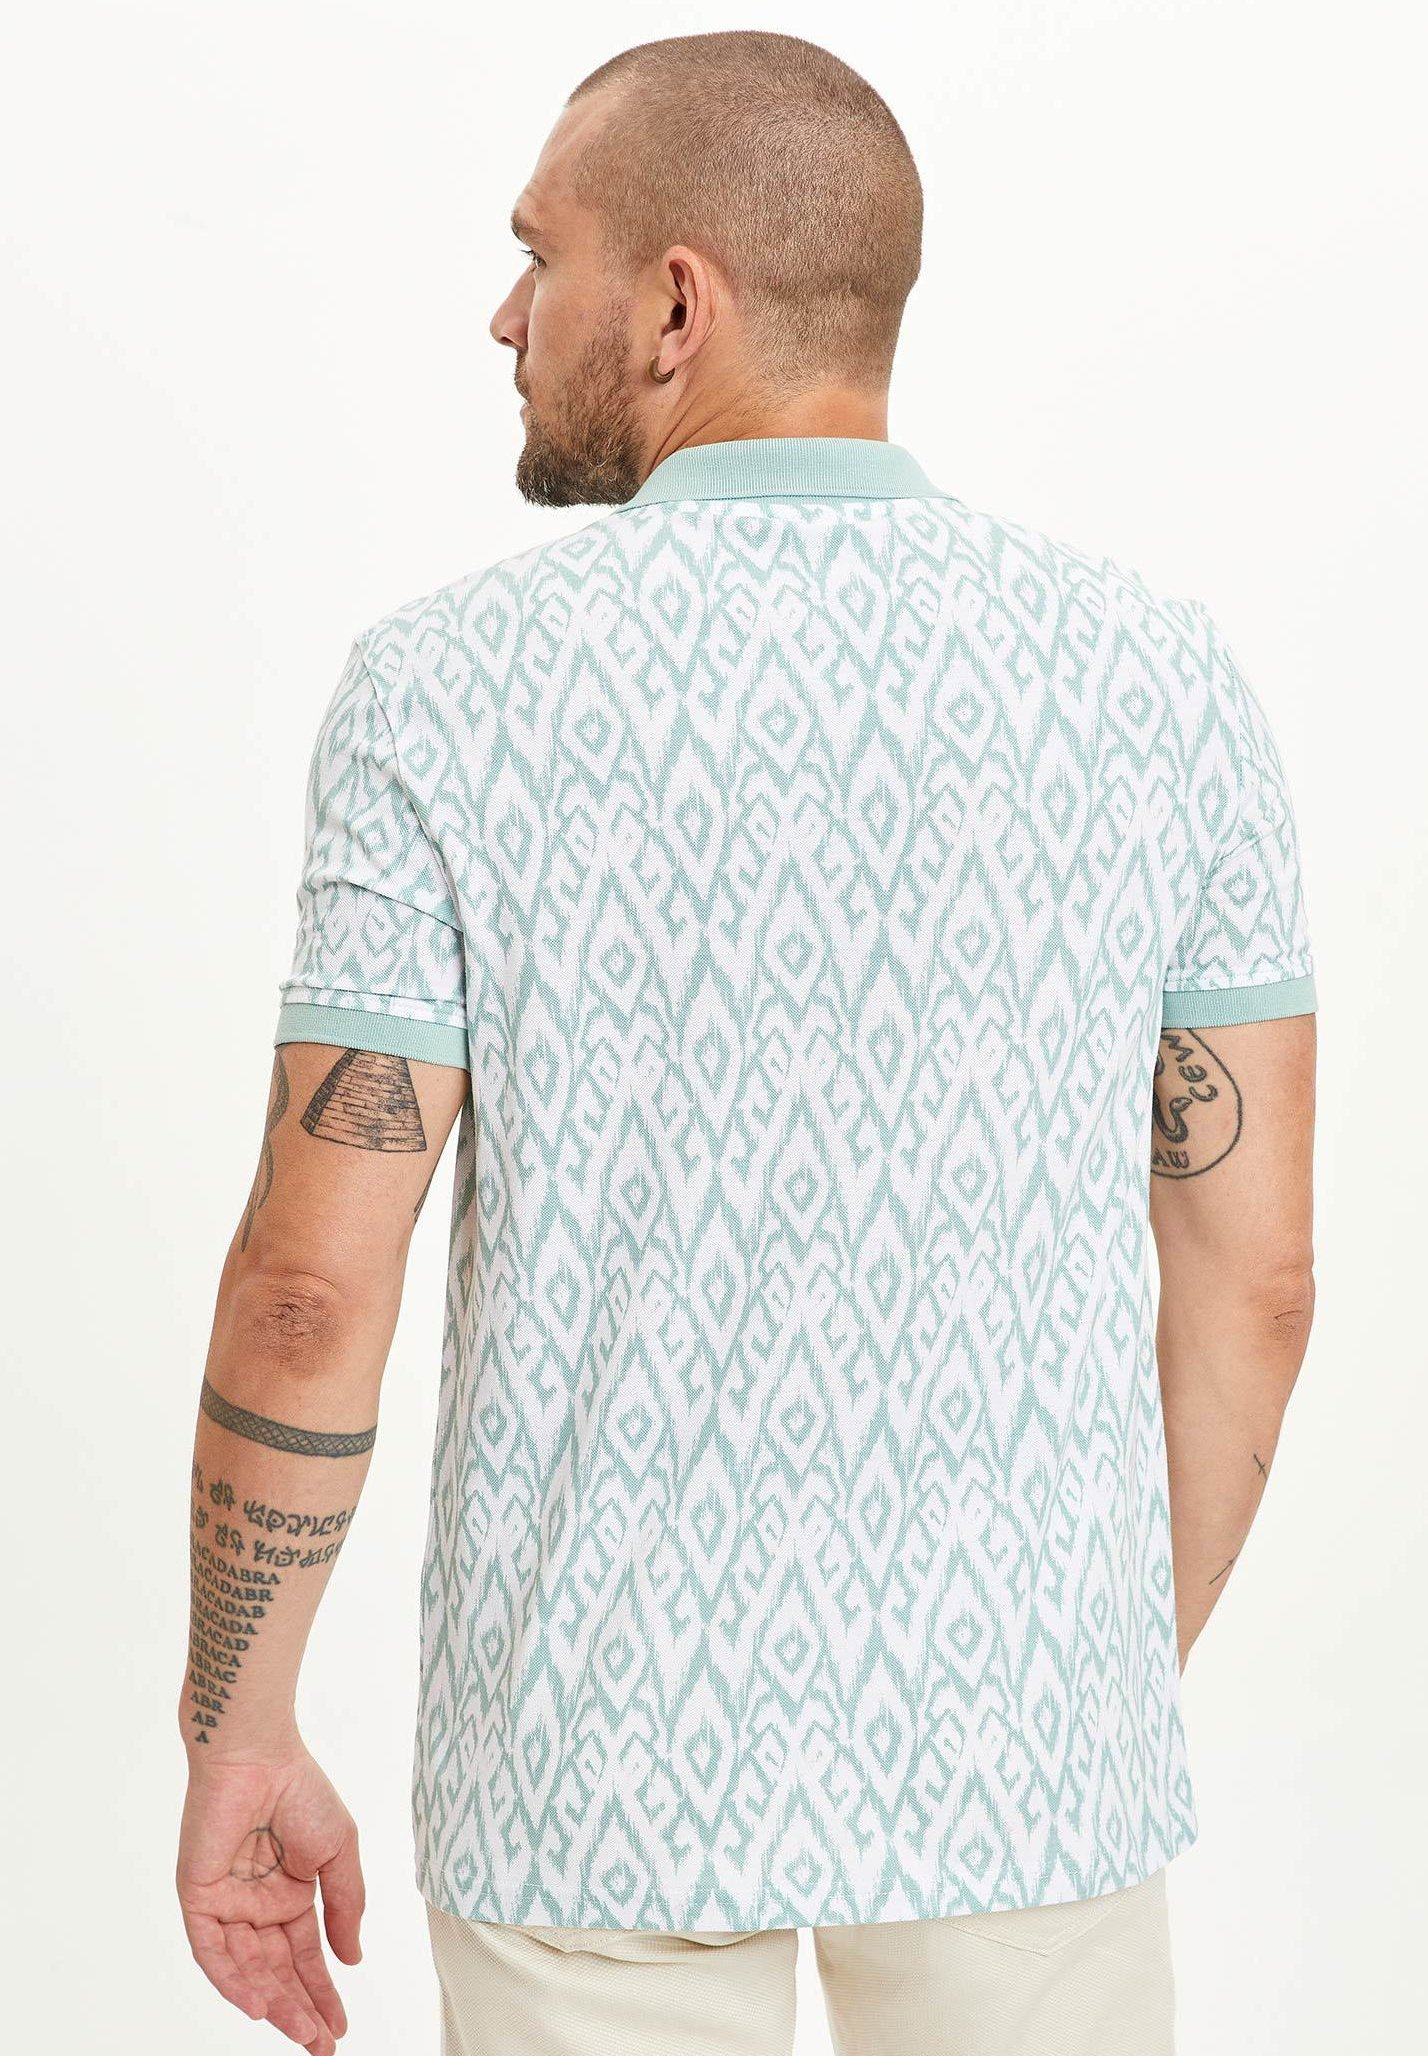 DeFacto Polo shirt - turquoise NffM3